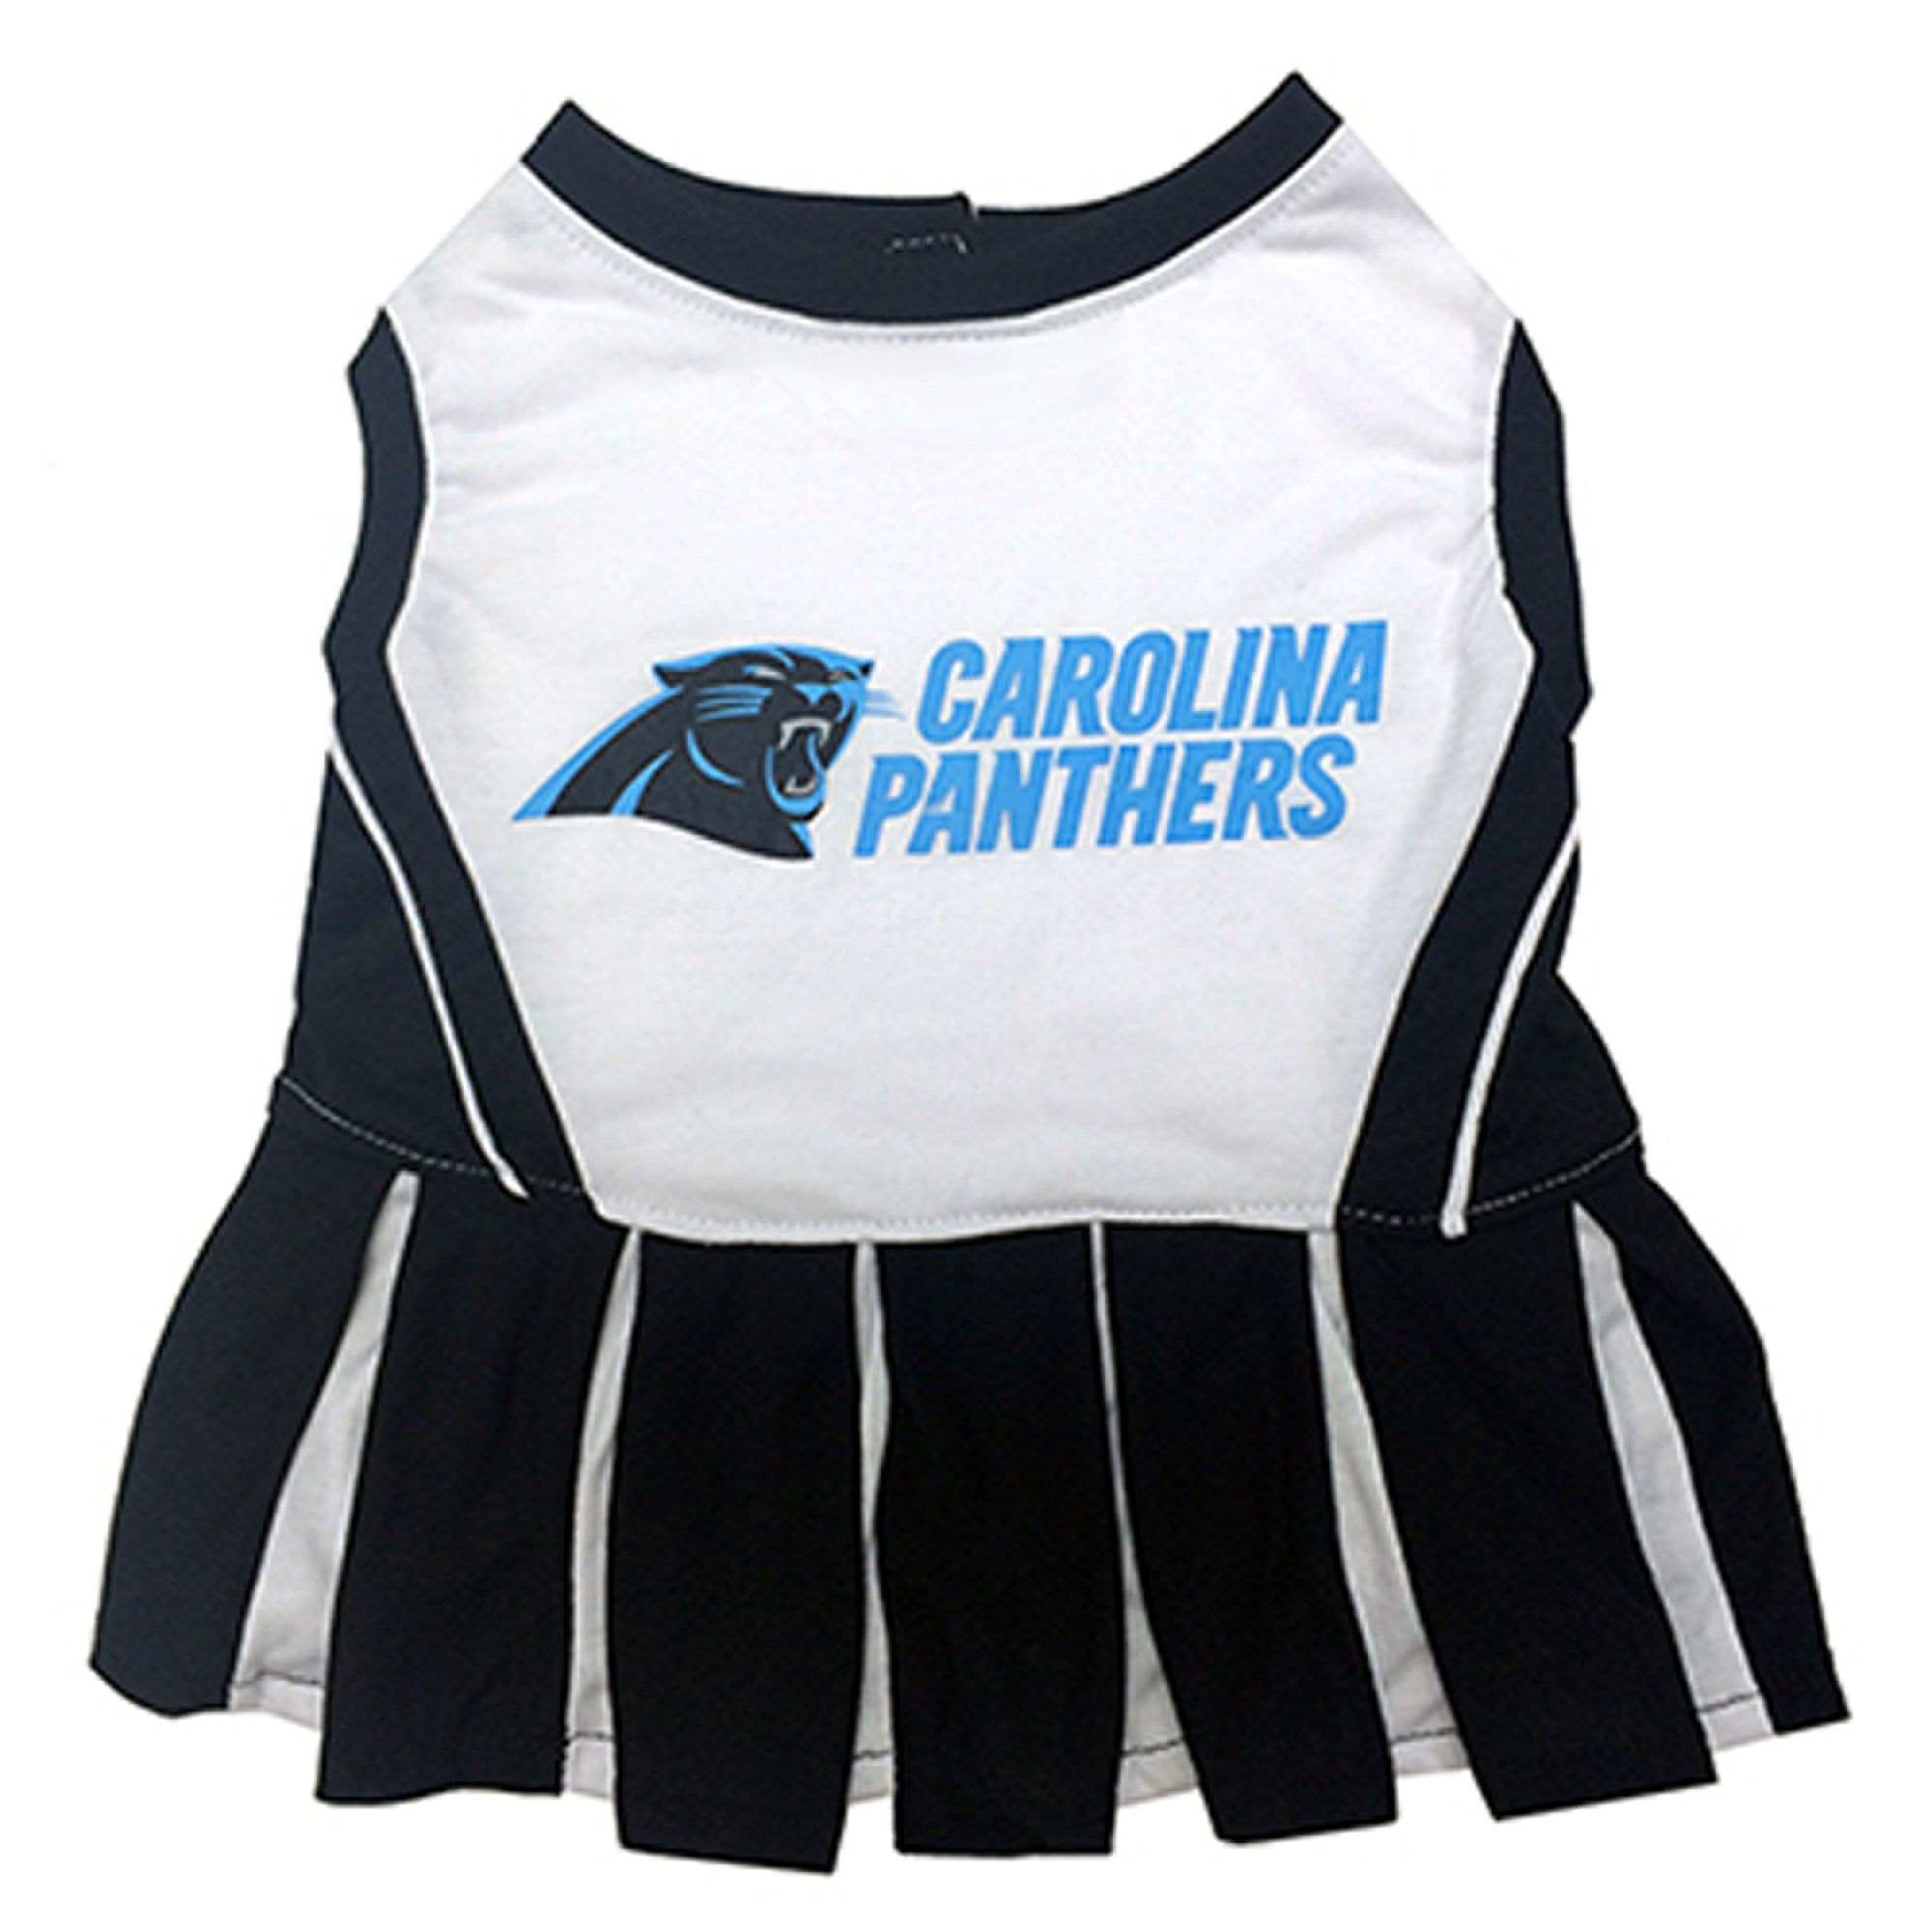 Carolina Panthers Nfl Cheerleader Uniform Size Medium Pets First